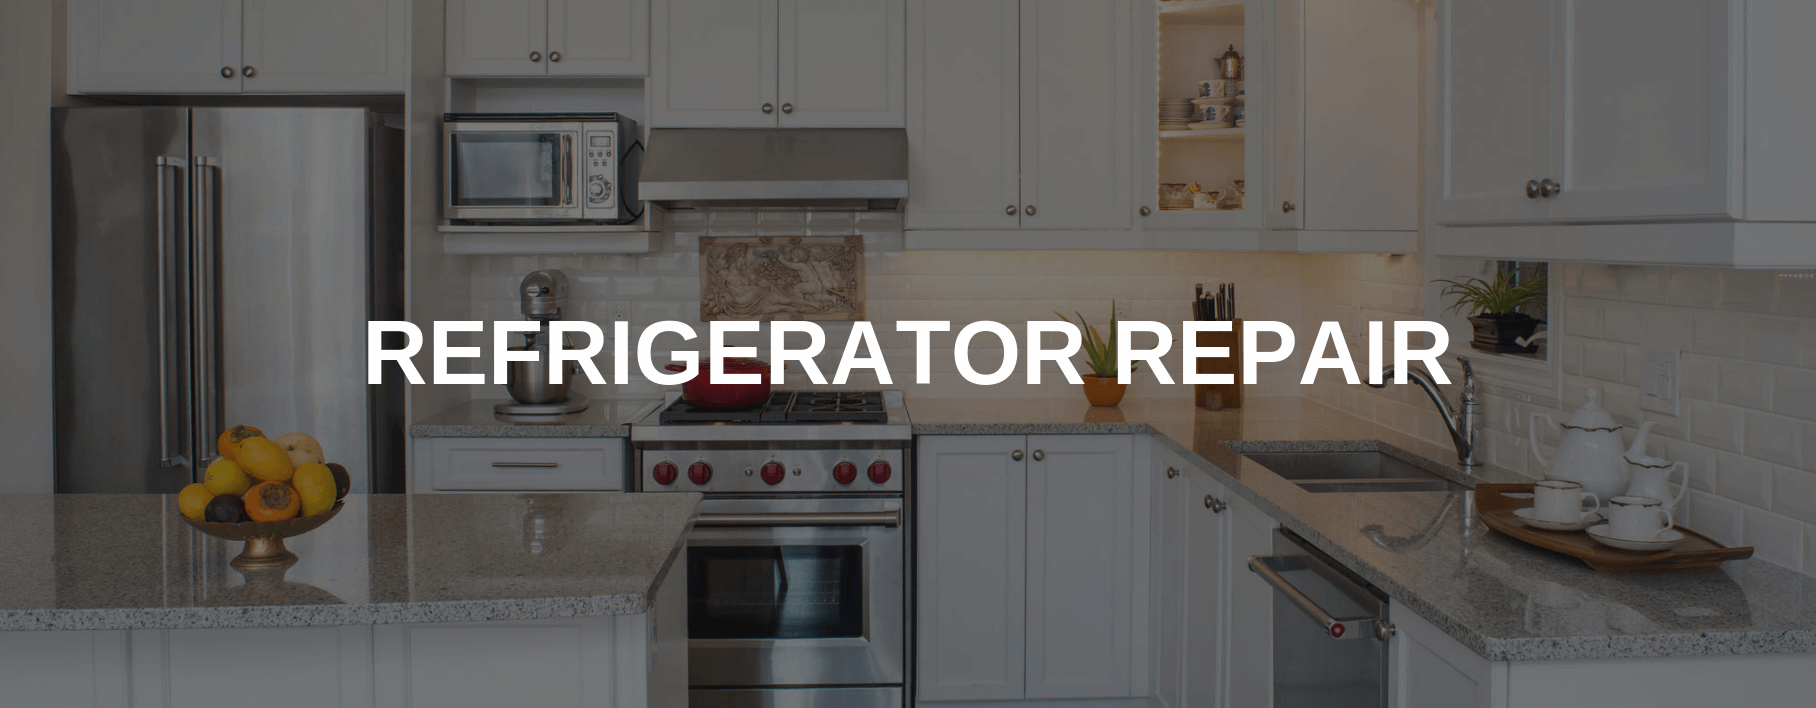 alexandria refrigerator repair